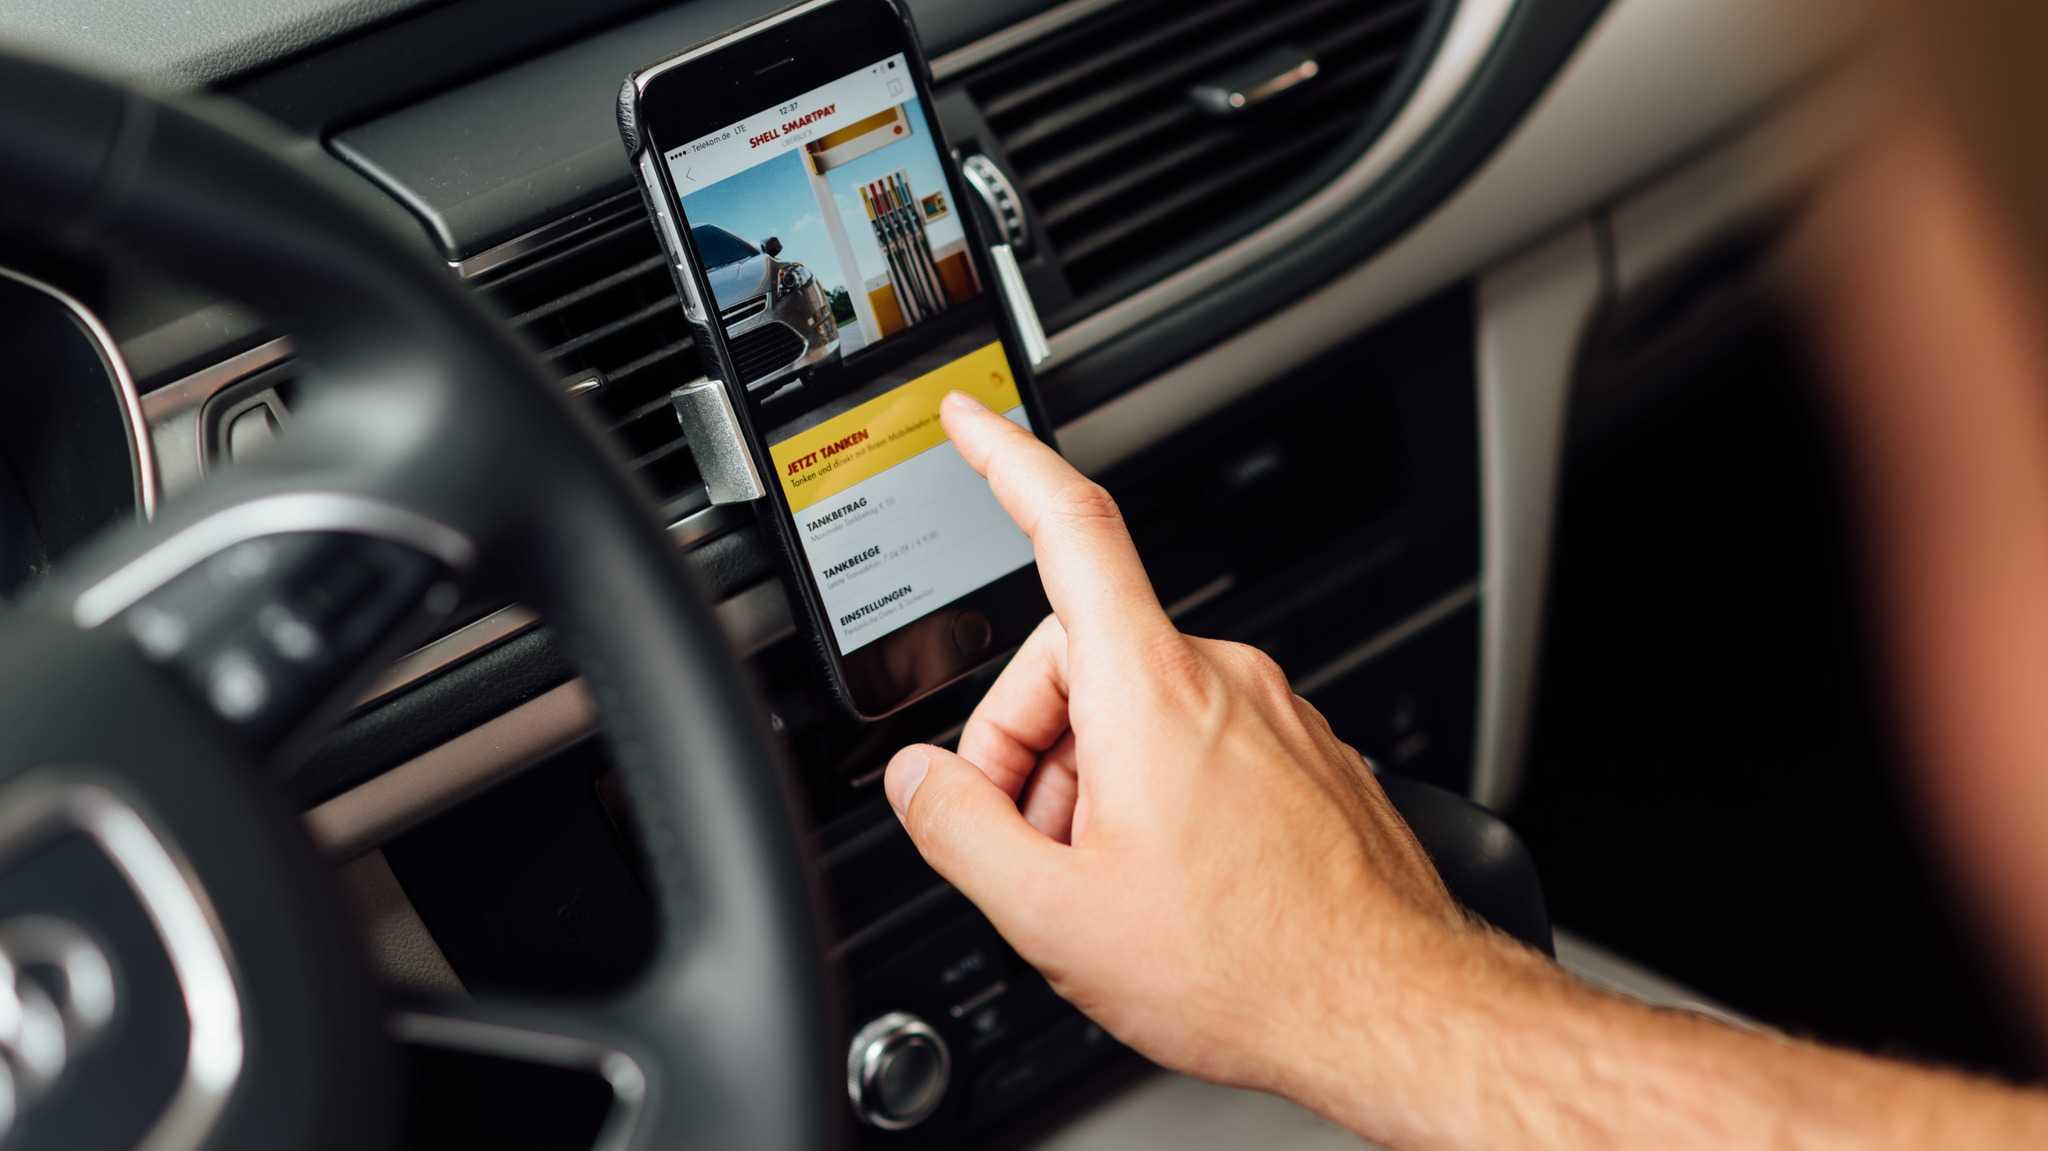 Shell und Paypal bieten mobiles Bezahlen an Tankstellen